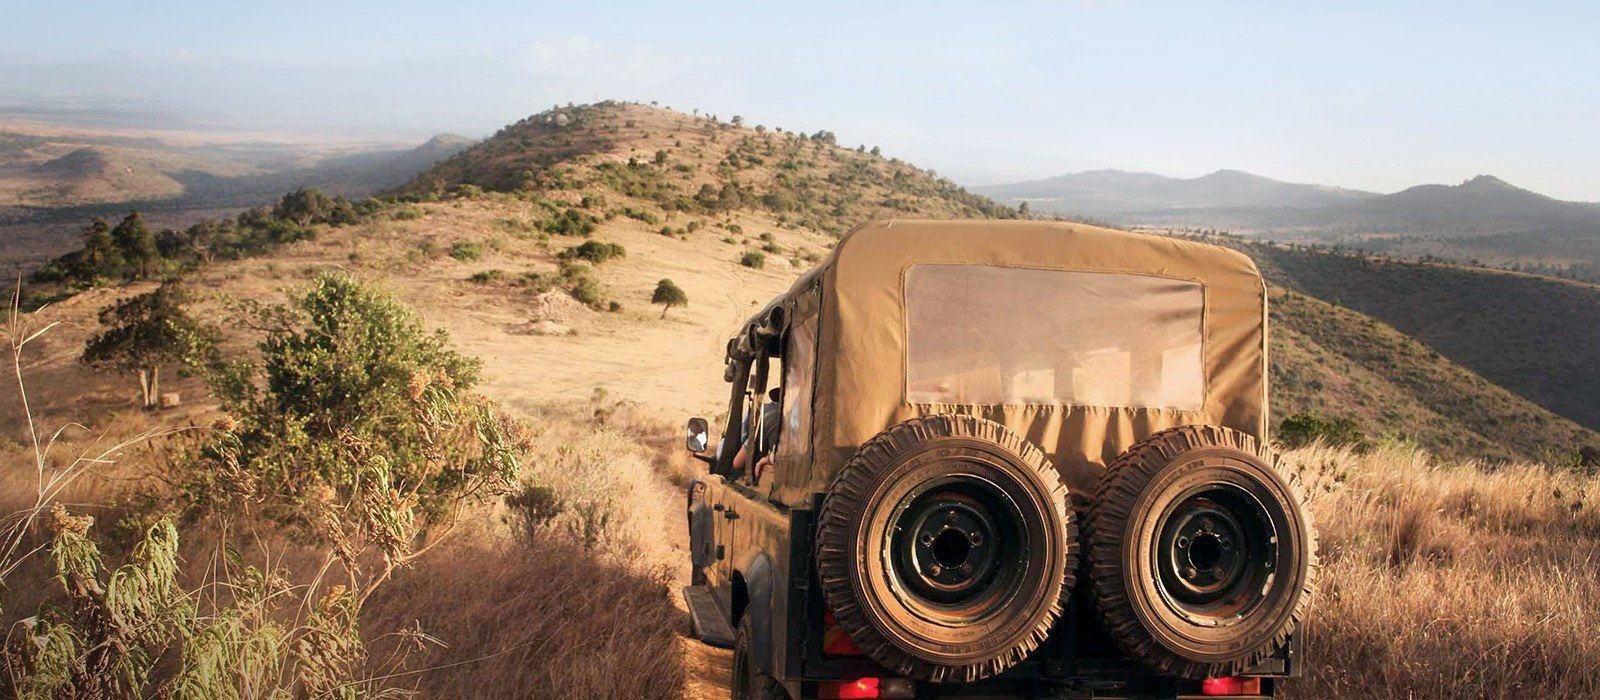 Kenia und Ruanda: Safari und Gorilla-Trekking Urlaub 3